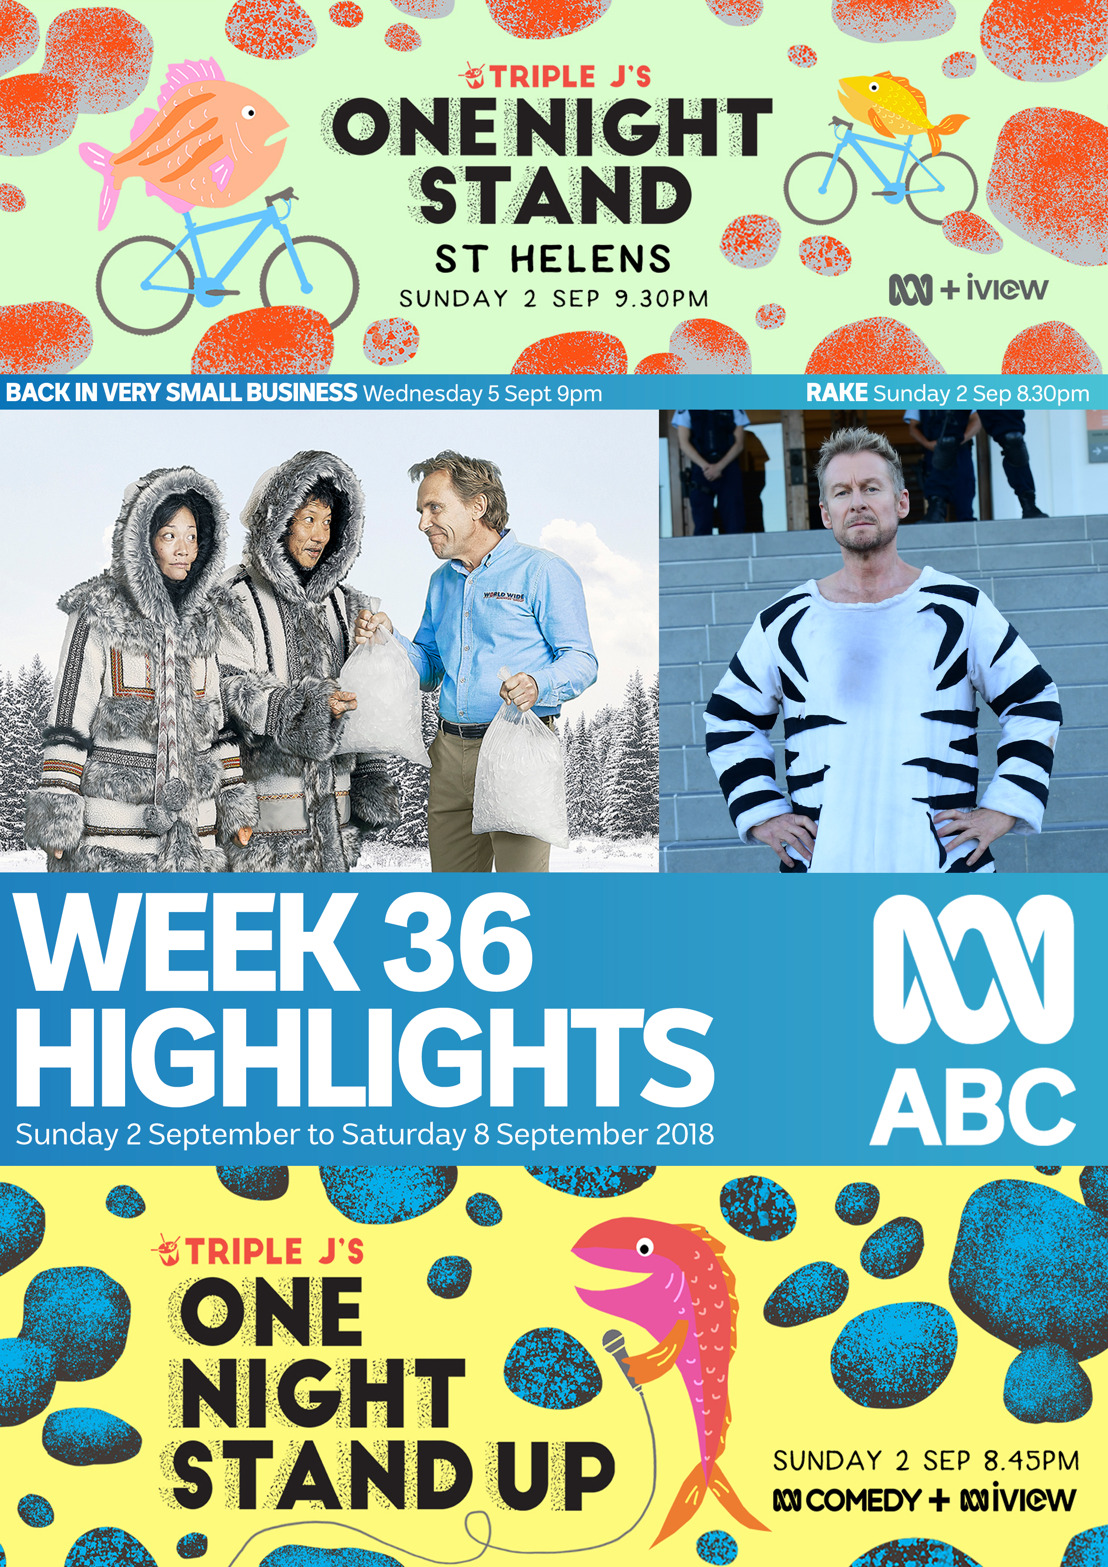 ABC TV Program Highlights - Week 36